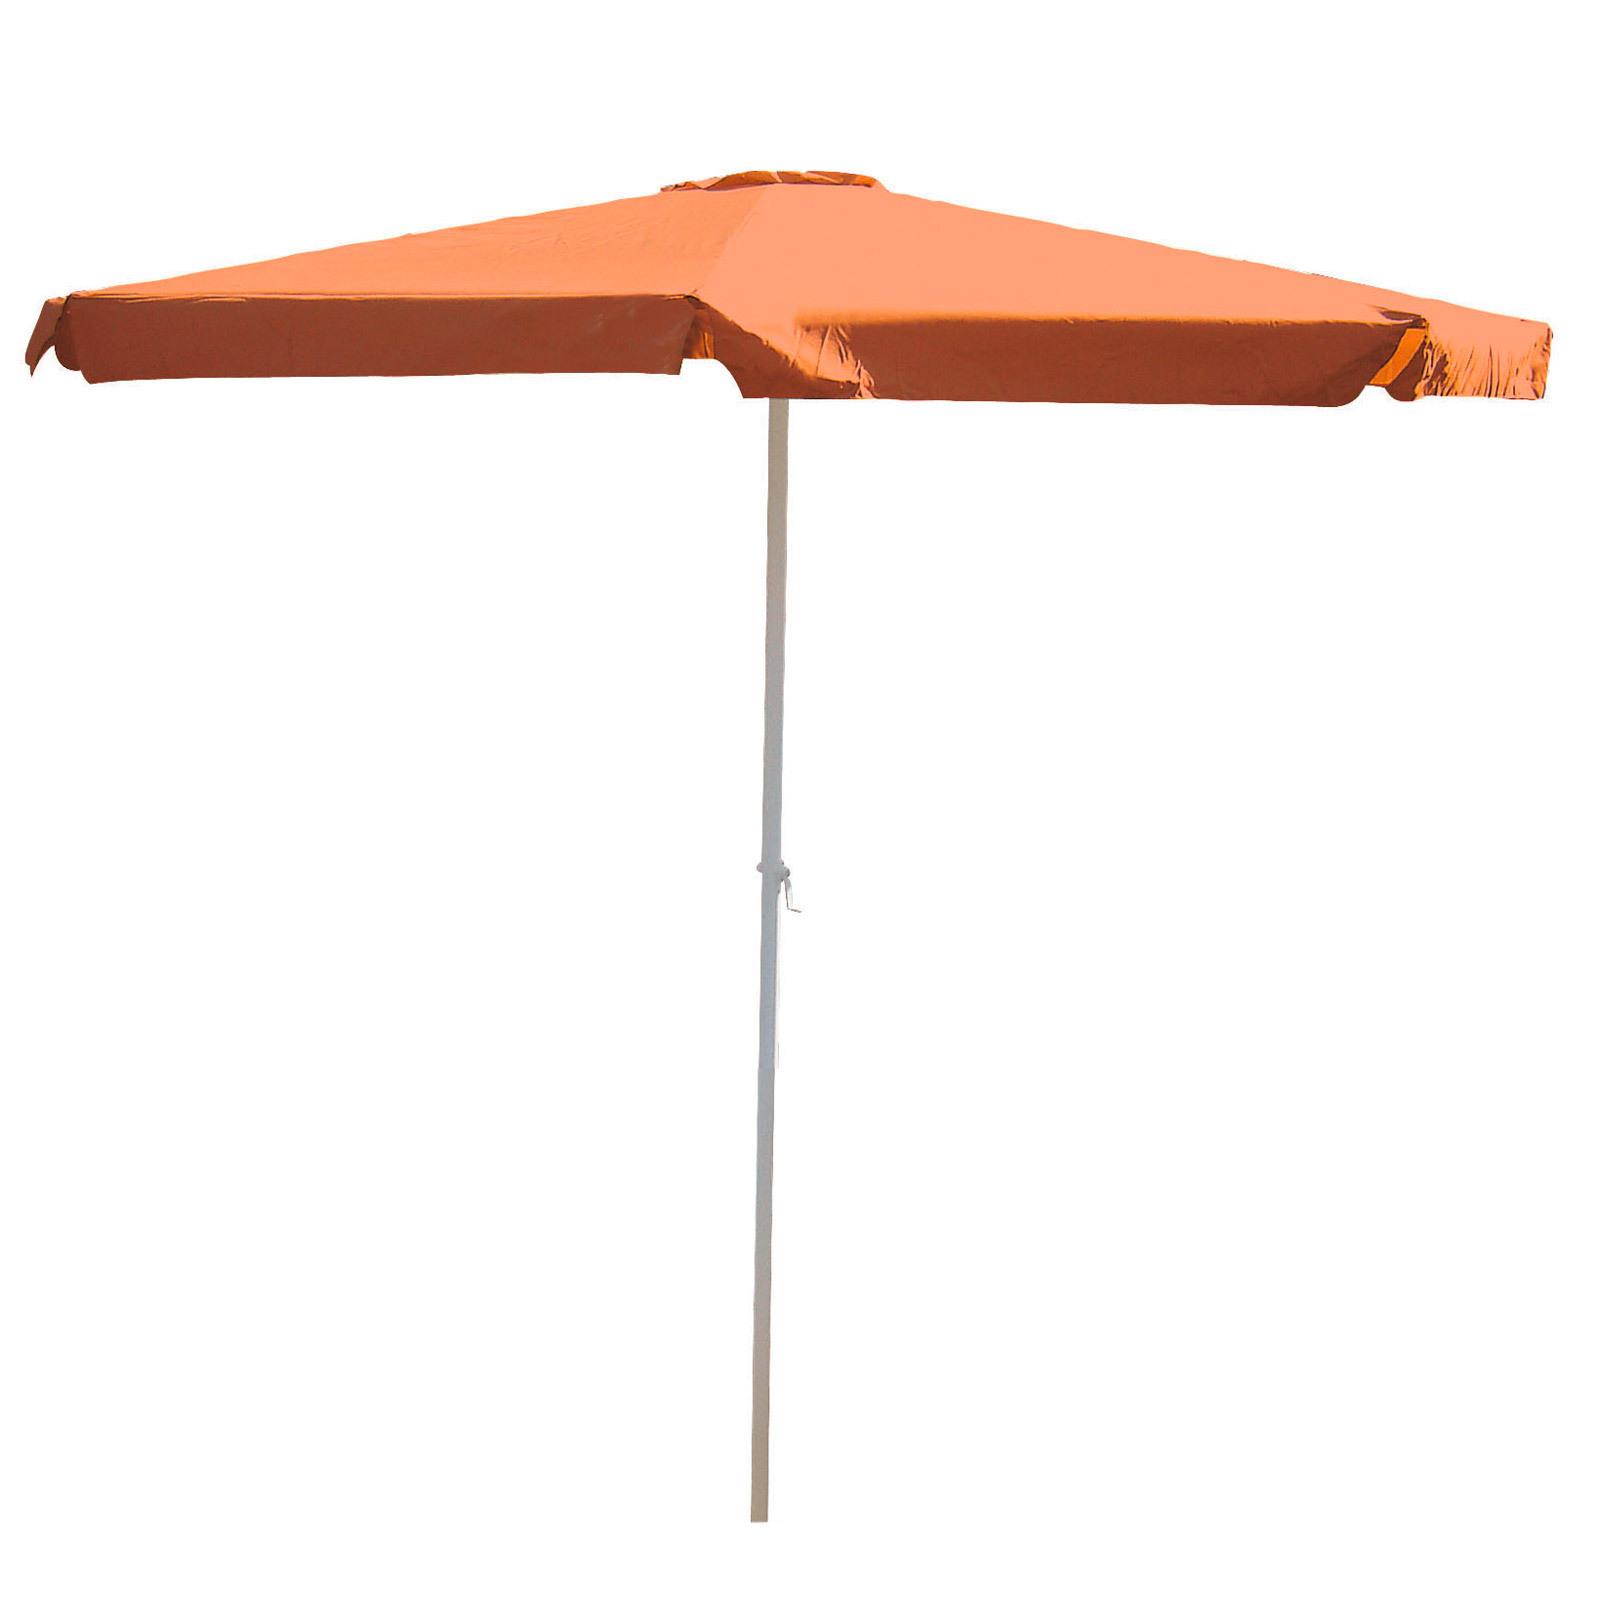 alu marktschirm kurbelschirm sonnenschirm gartenschirm 3 5 m kurbel terracotta ebay. Black Bedroom Furniture Sets. Home Design Ideas